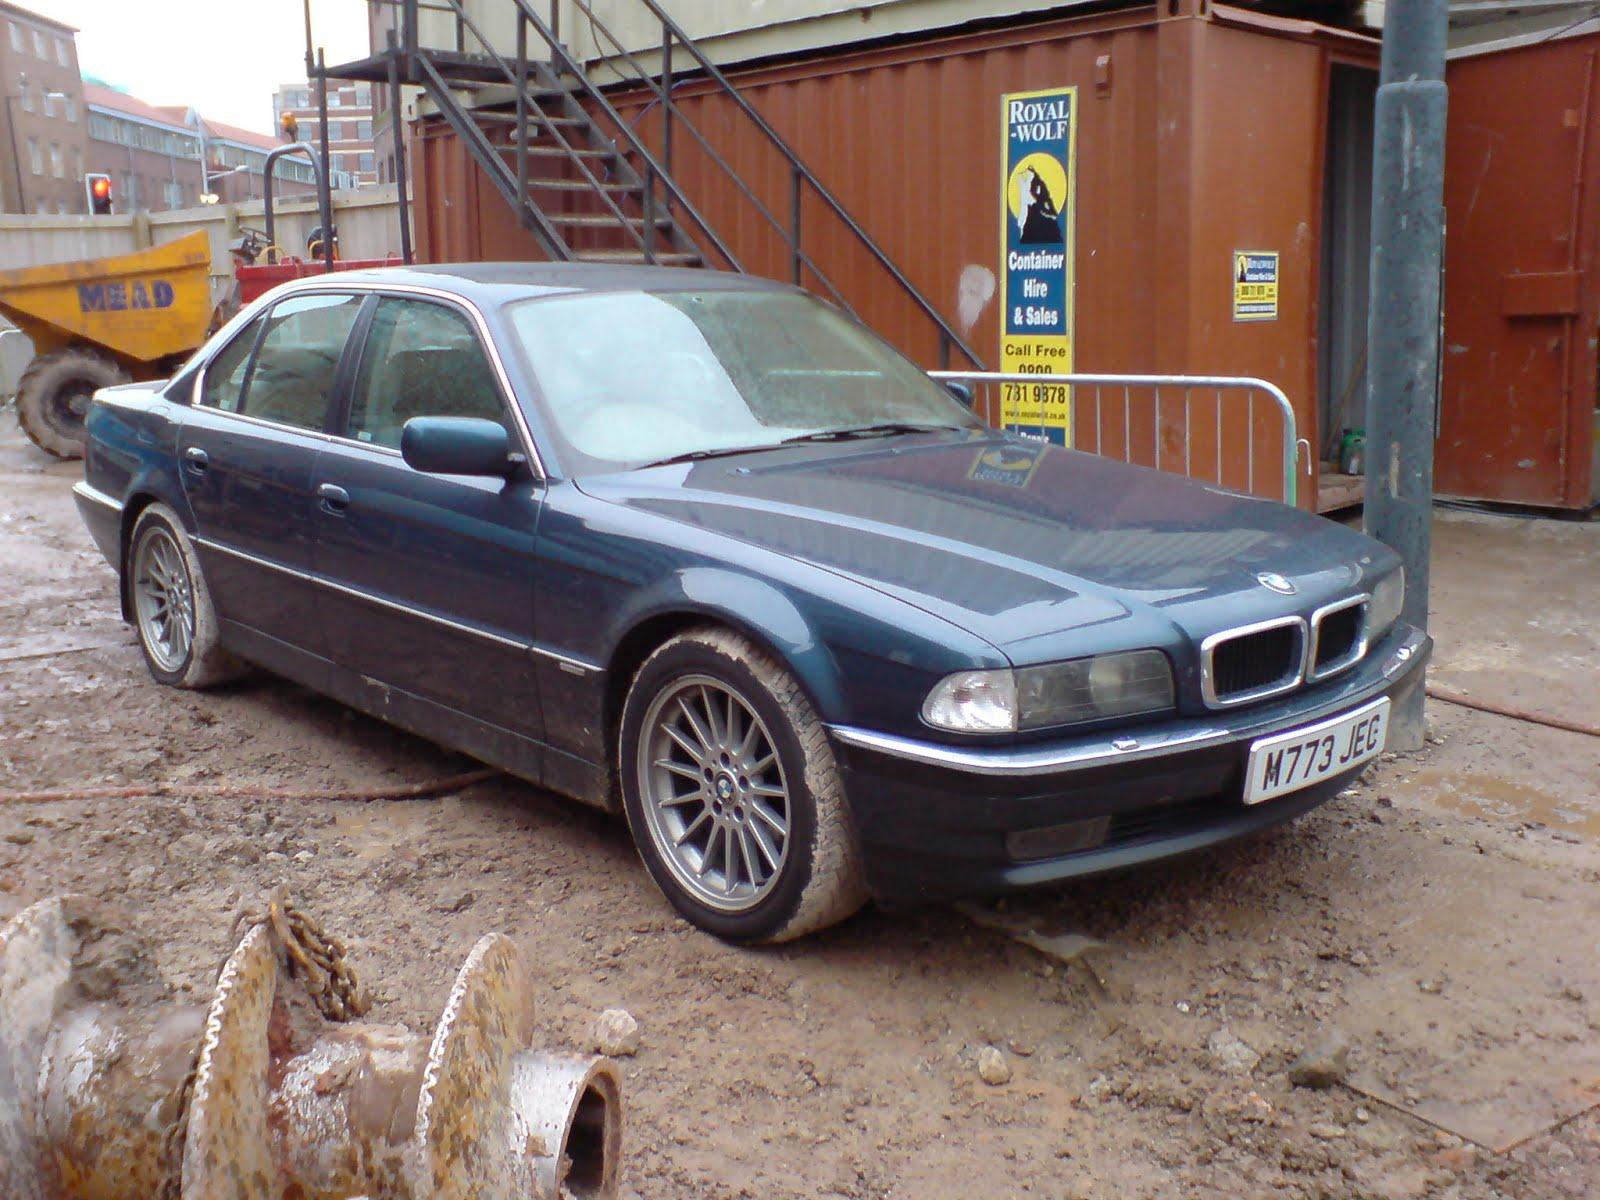 bmw, e38, seven series, 7 series, german, cars, motoring, james bond, automotive, 730i, 730, car, cars